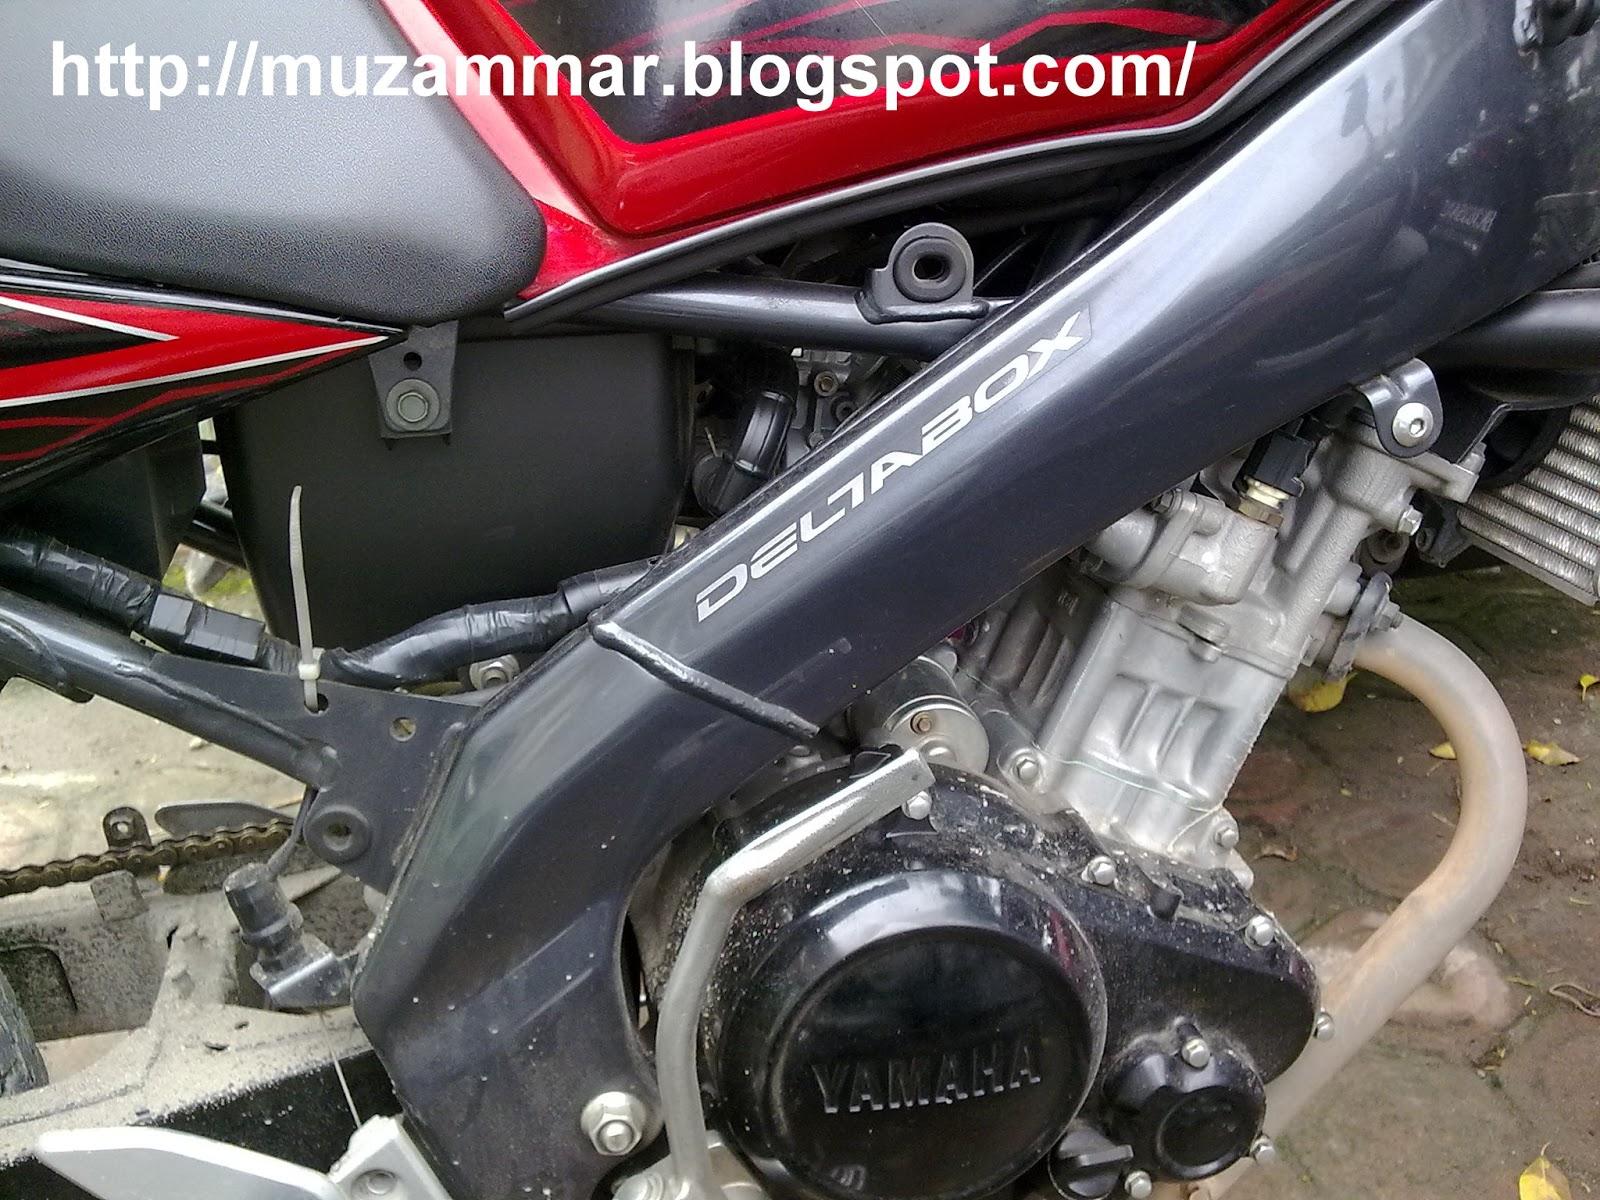 Modifikasi Yamaha Vixion (Old Vixion)